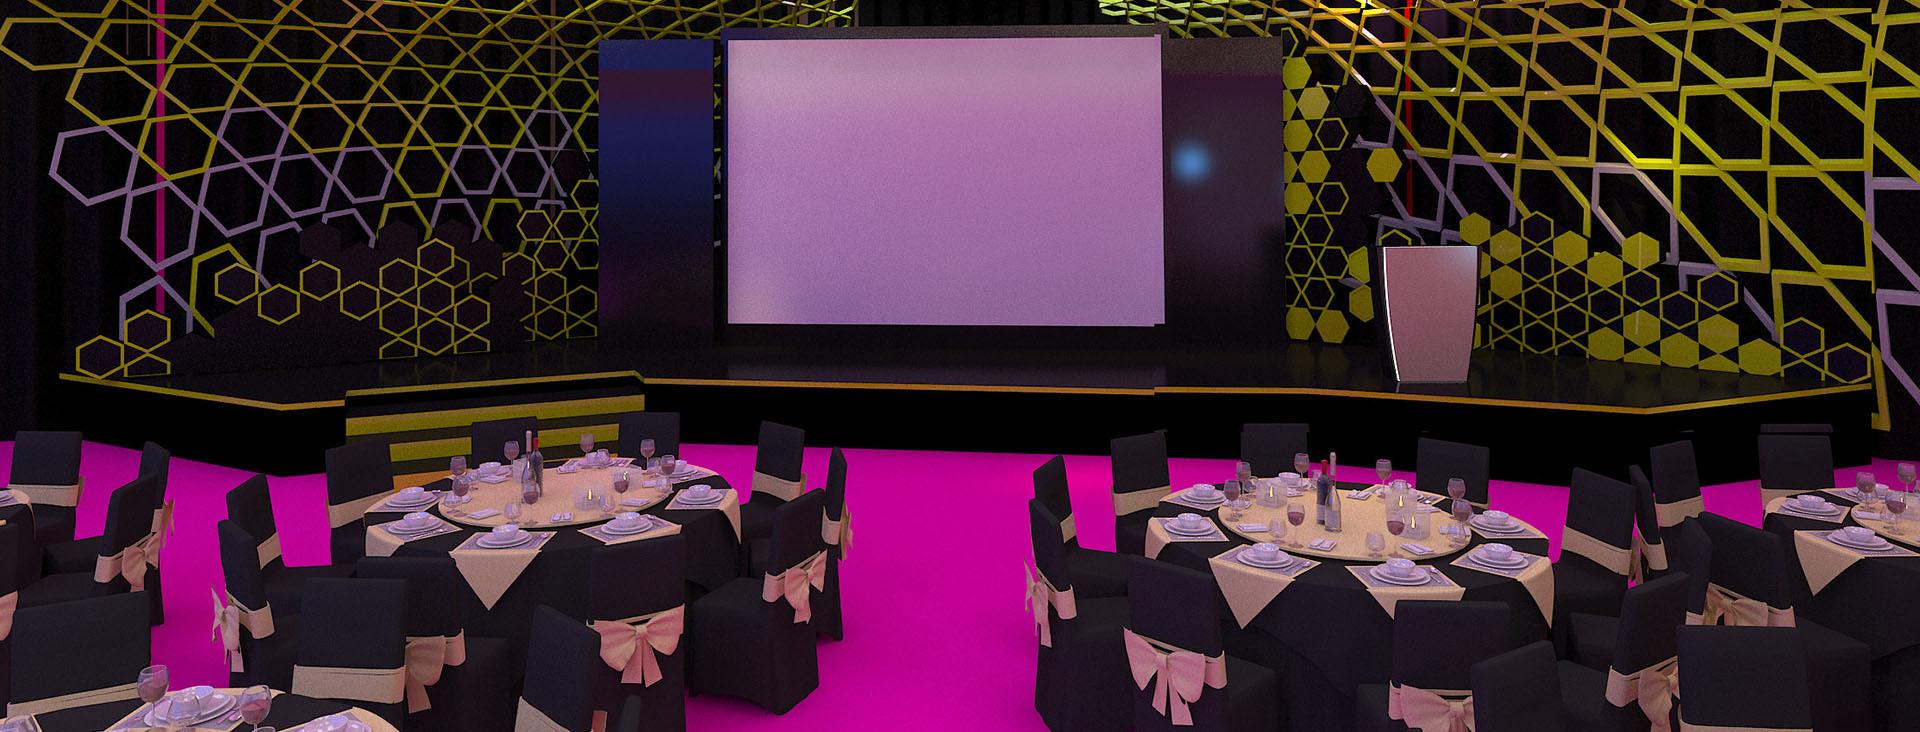 Corporate Event Management company in Dubai